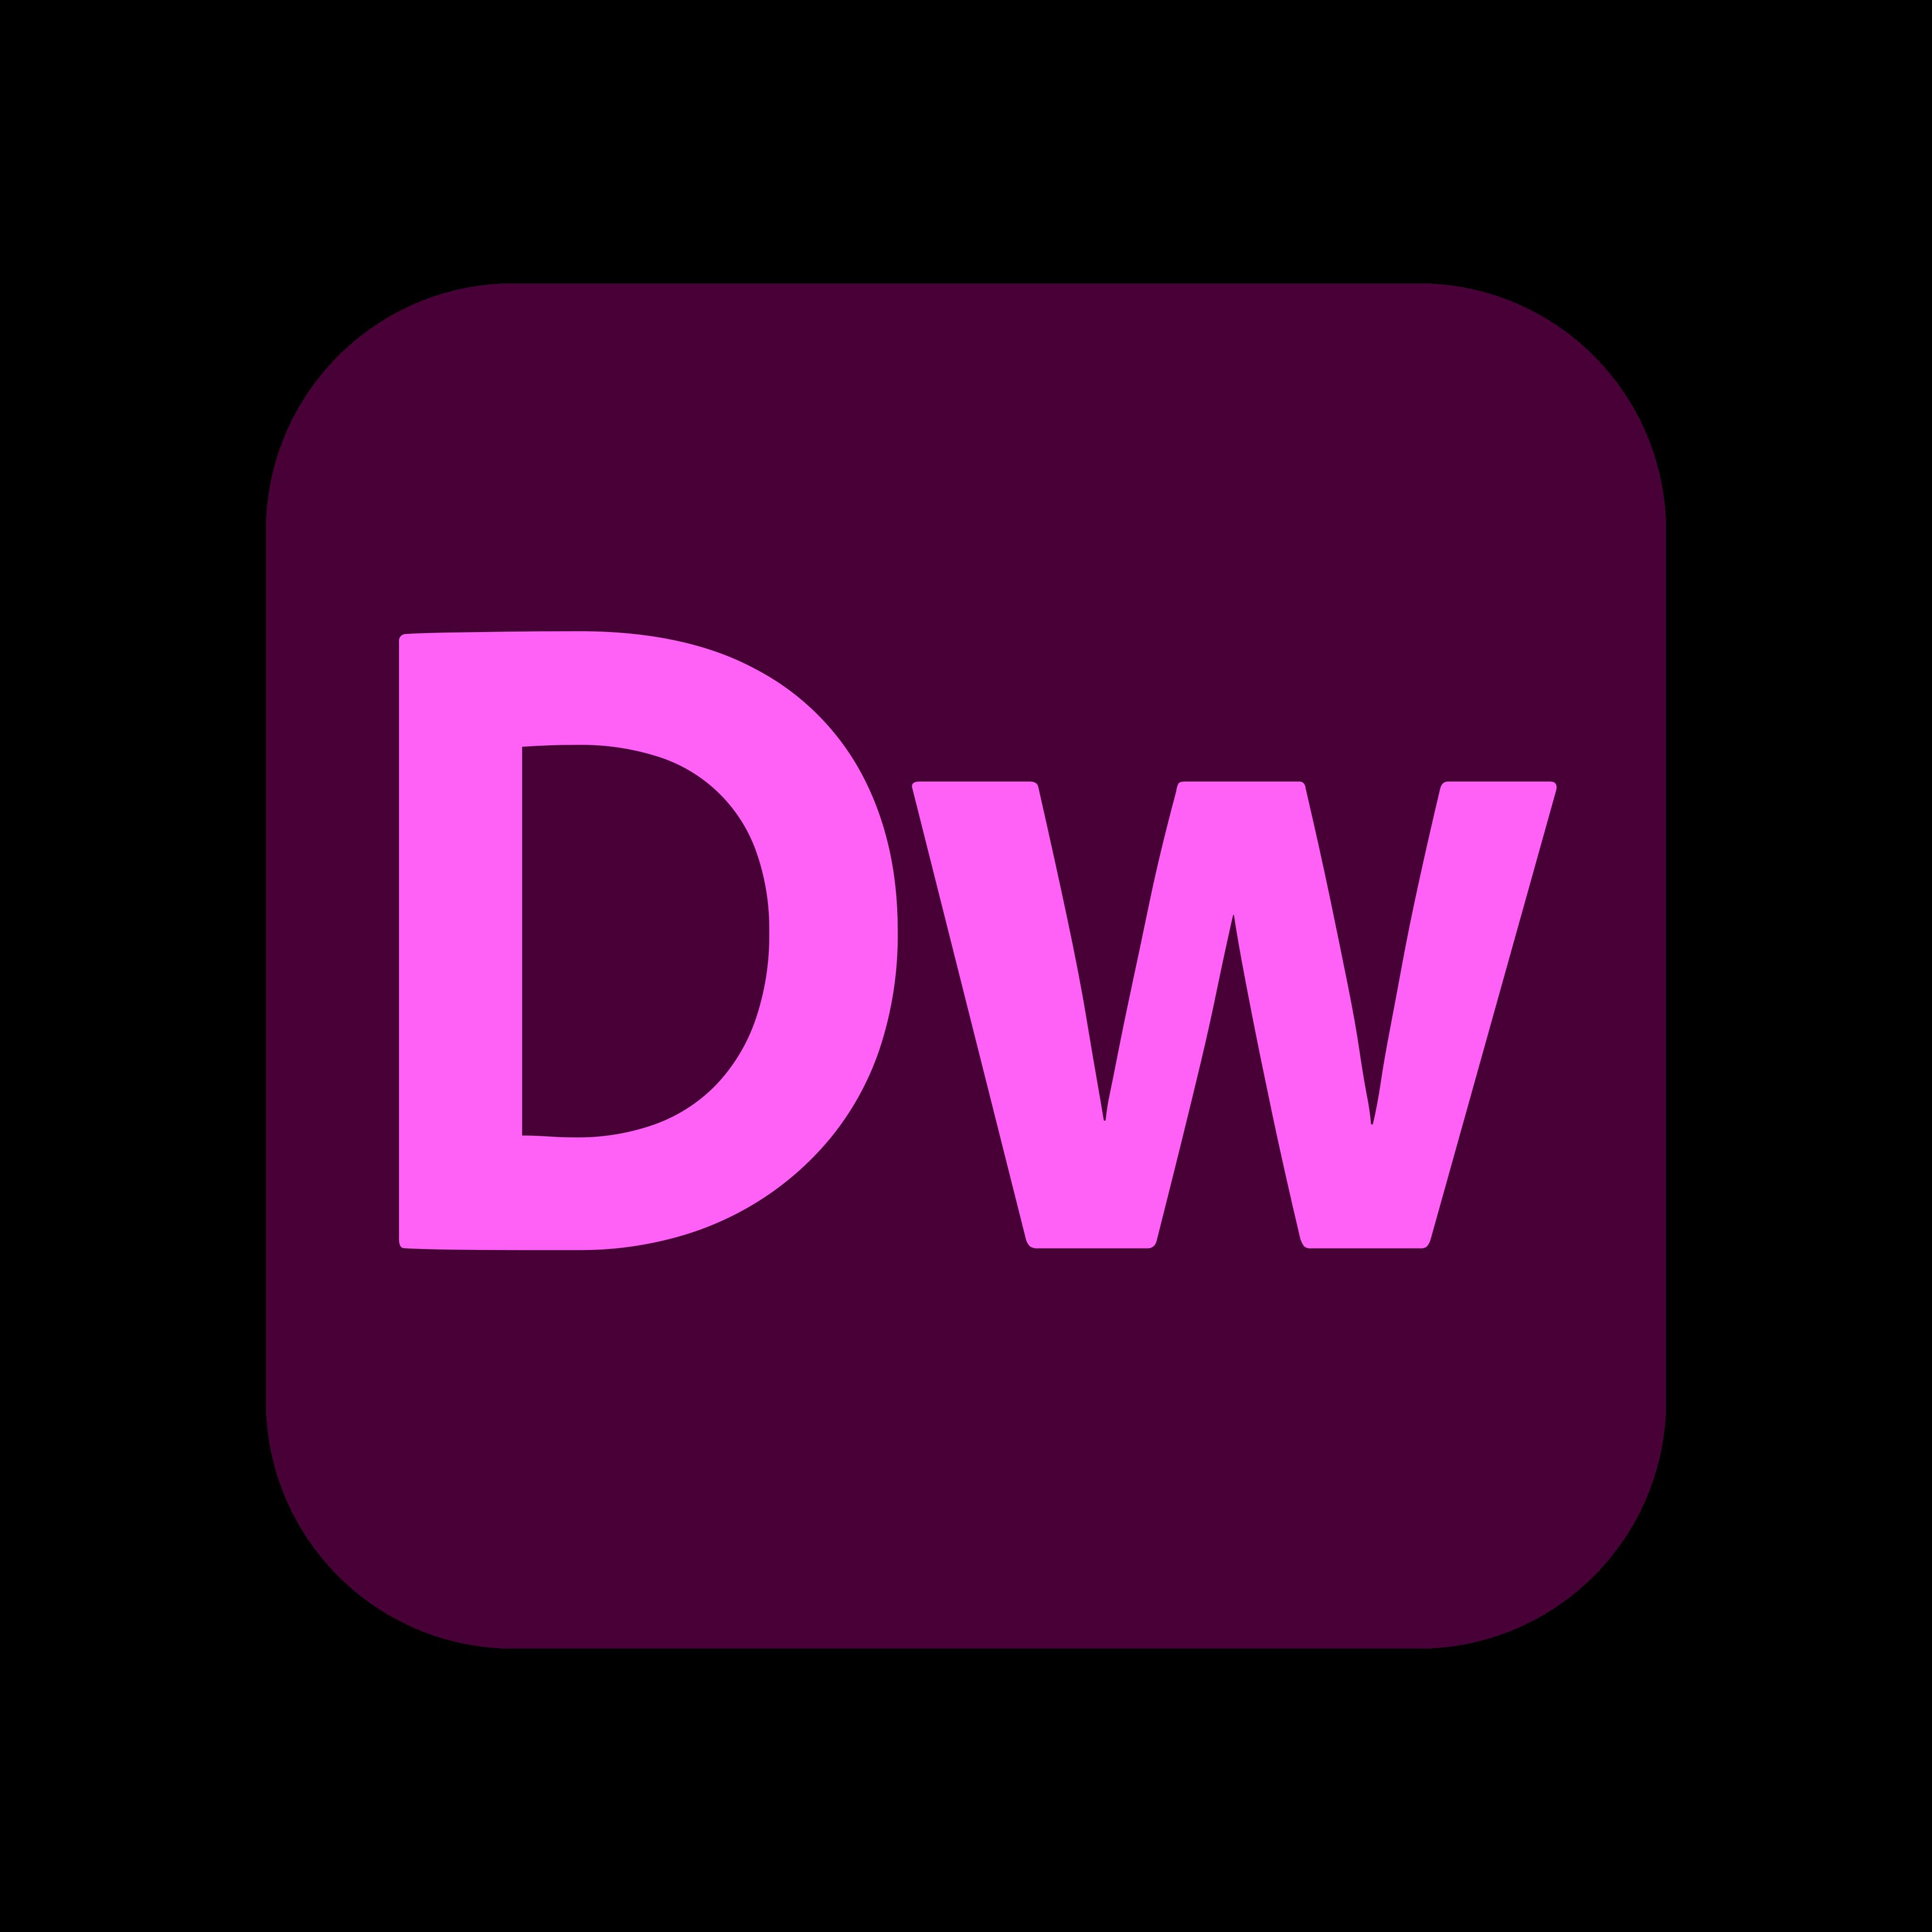 adobe dreamweaver logo 0 1 - Adobe Dreamweaver Logo